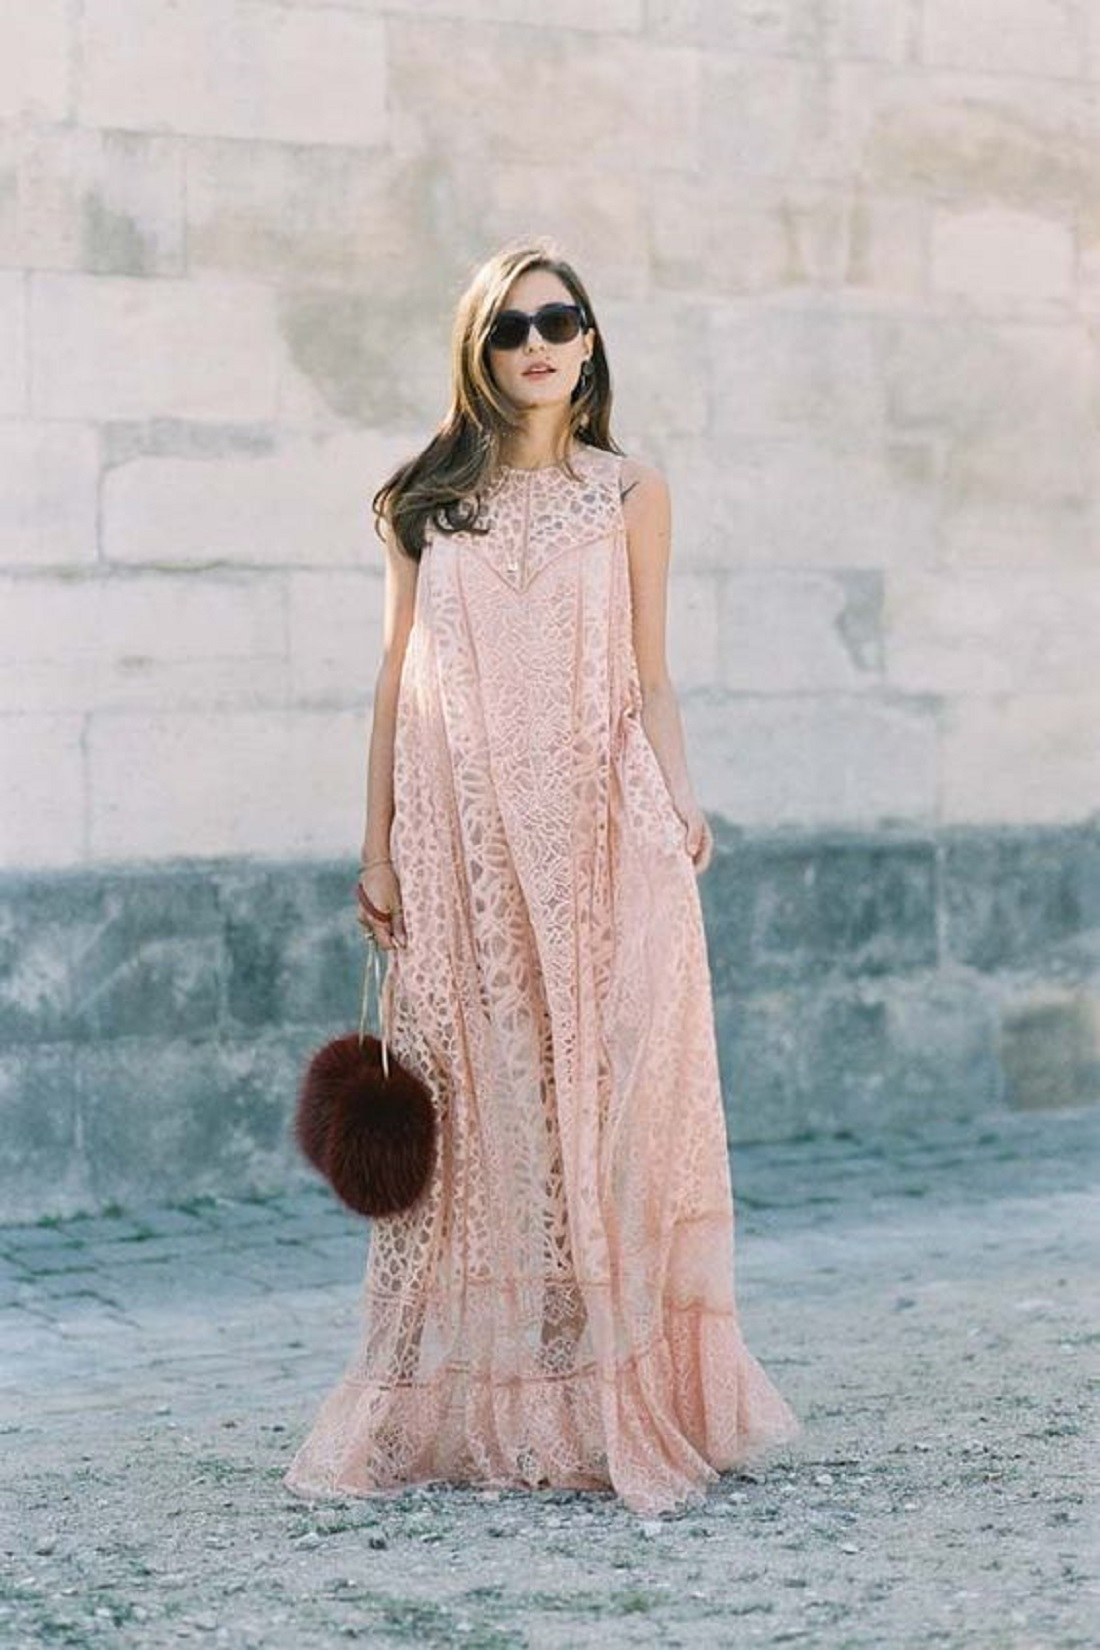 @projectfairytale: Blush Wedding Dresses for Daring Brides